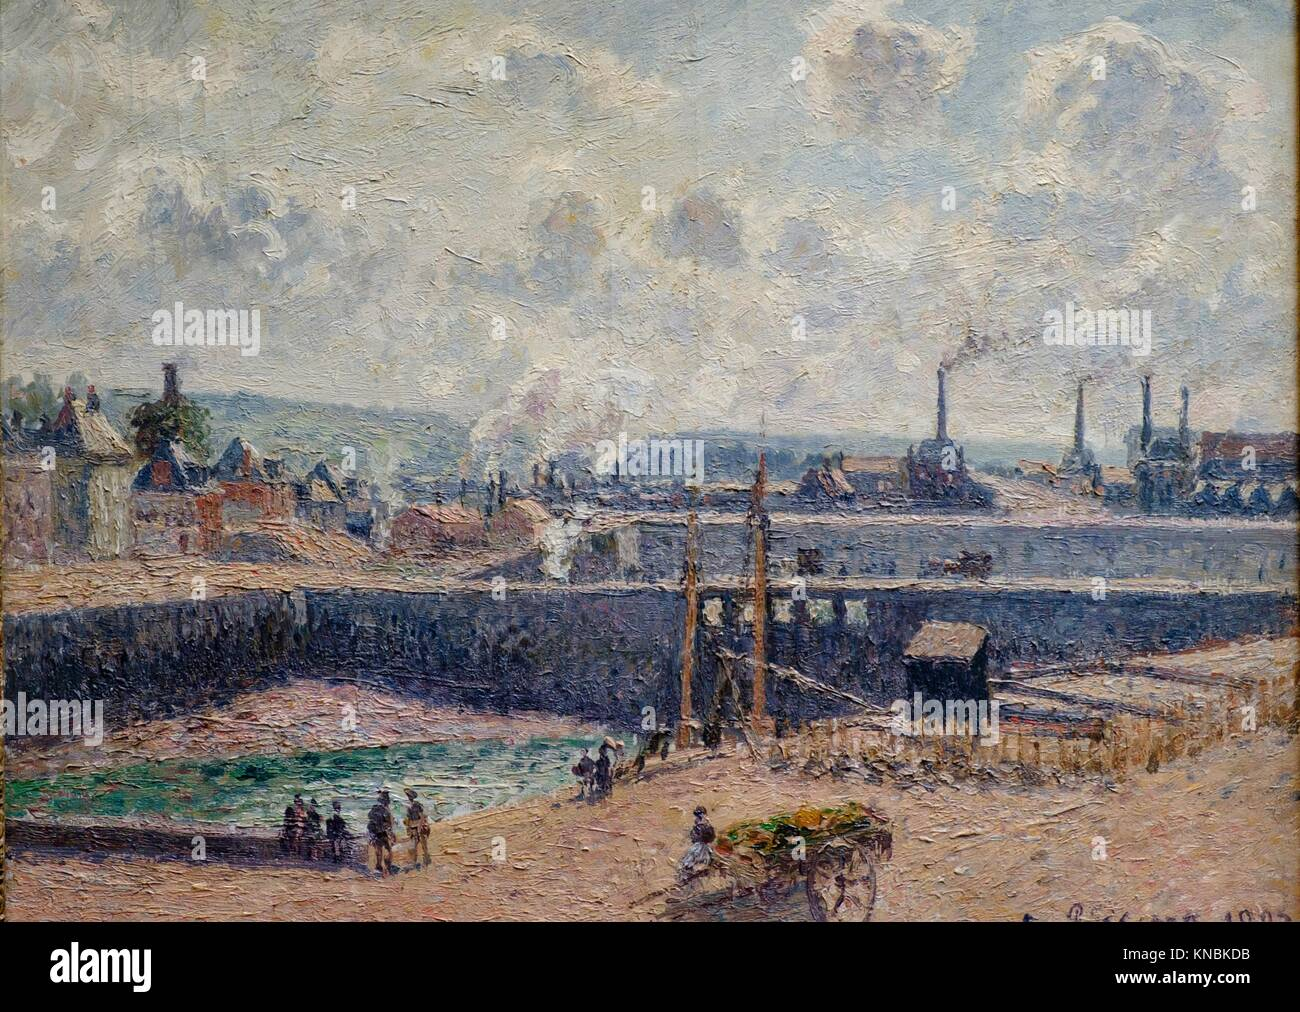 Camille Pissarro,. Dieppe, bassin Duquesne. Marée basse, soleil, matin,. 1902,. huile sur toile, Orsay Museum, - Stock Image